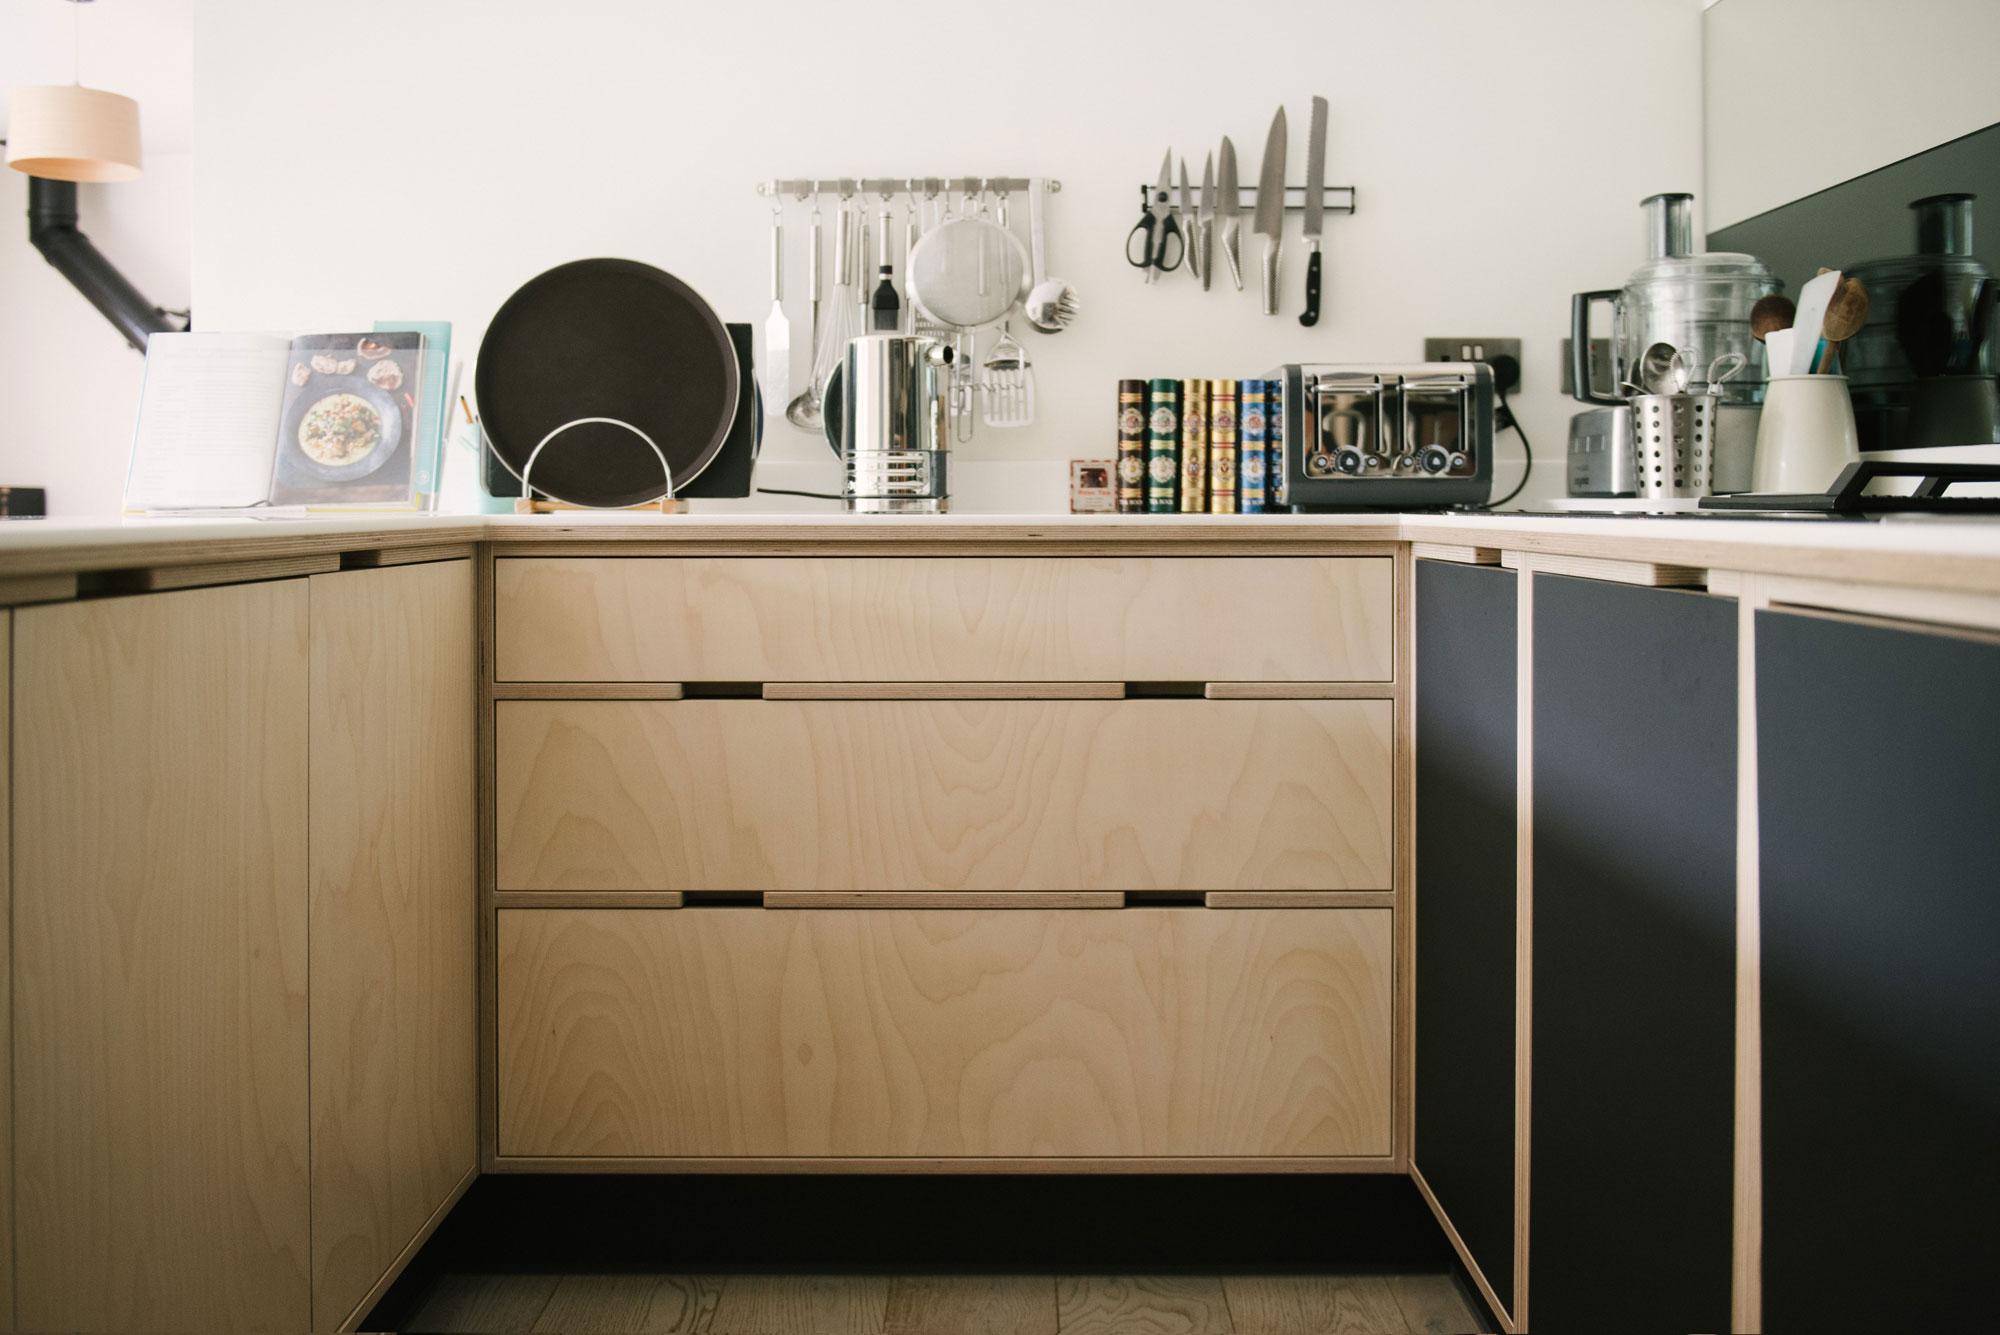 Birch Ply Drawer Unit in Black Plywood Kitchen